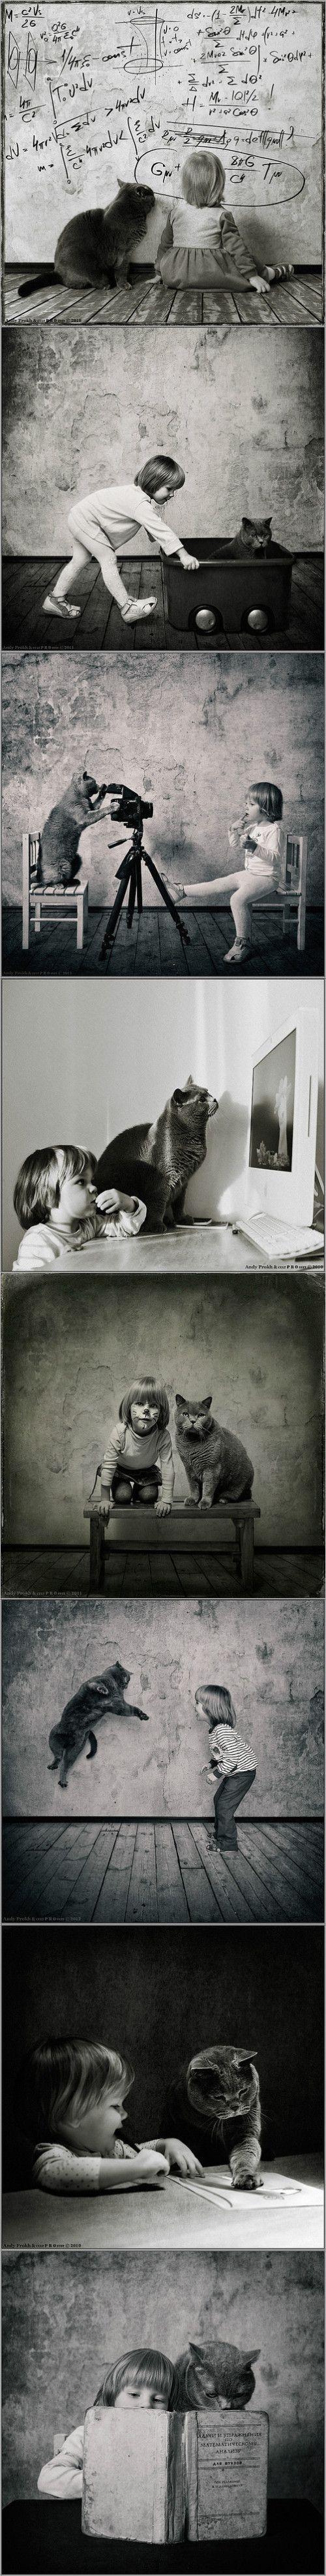 this is so precious!